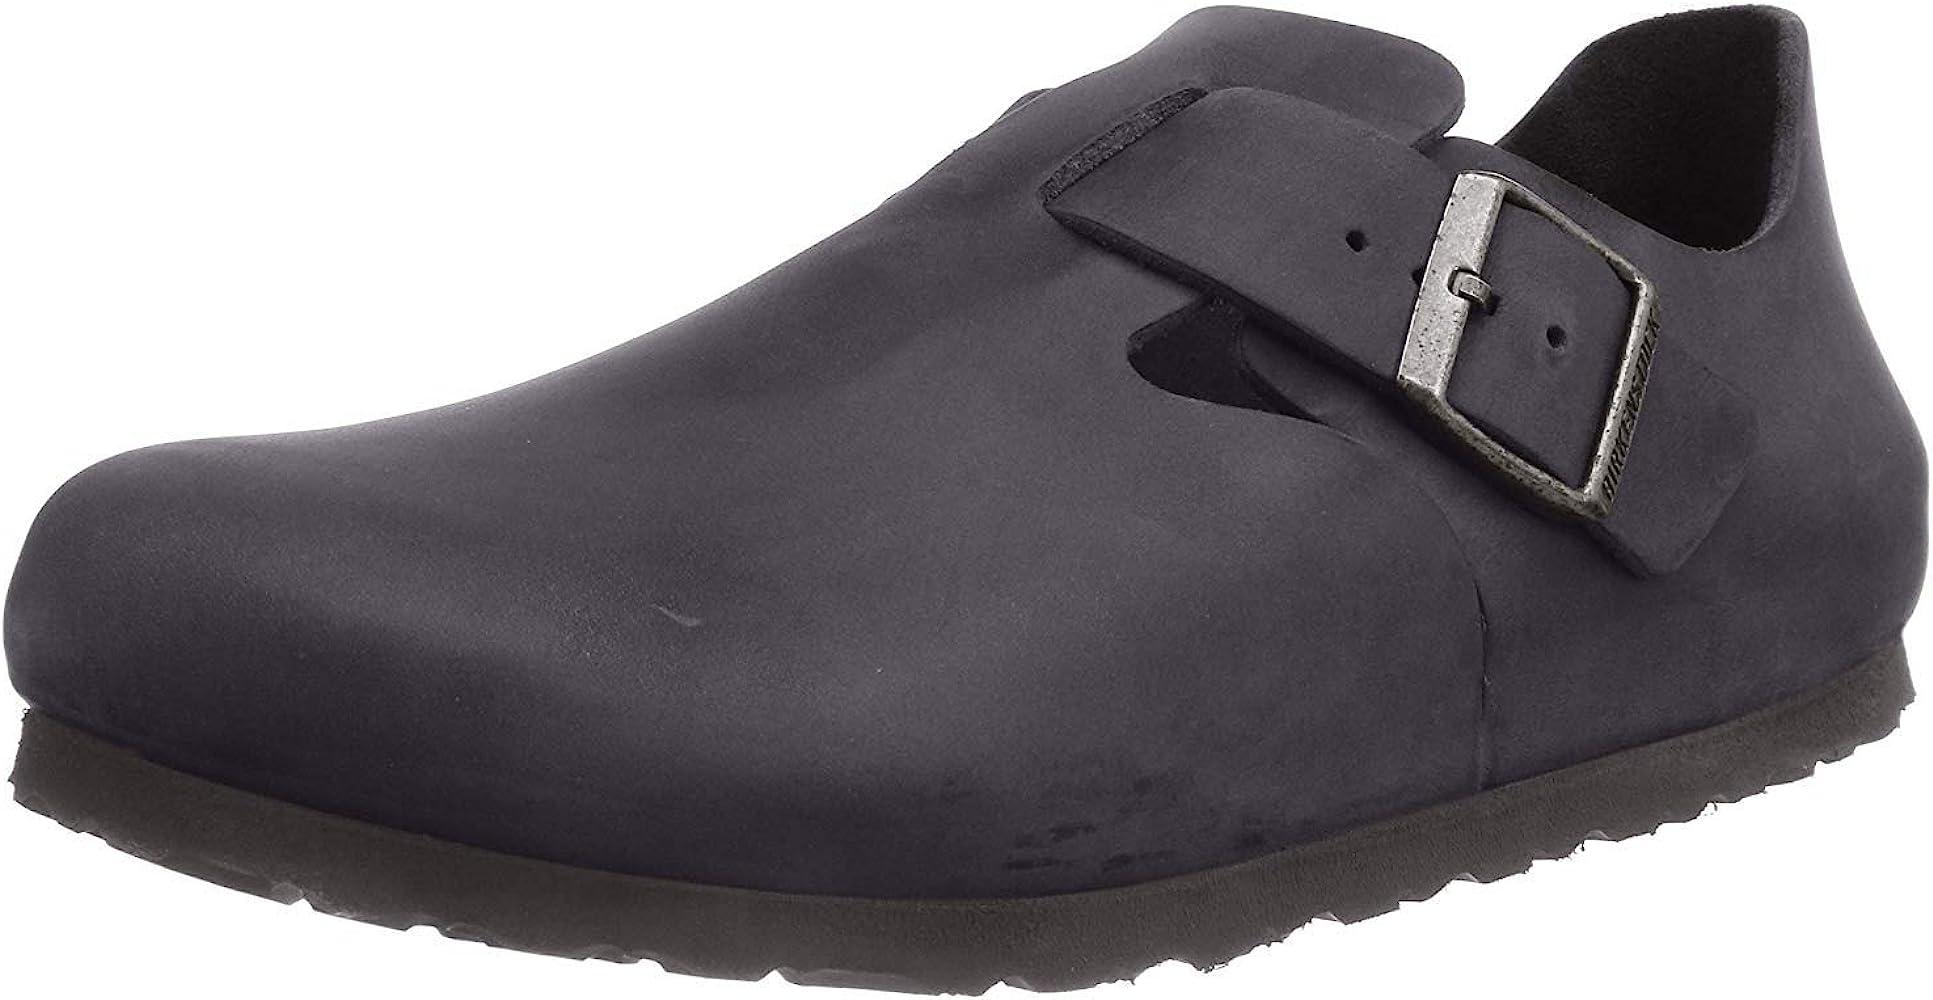 London Black Leather Sandals 41 Narrow